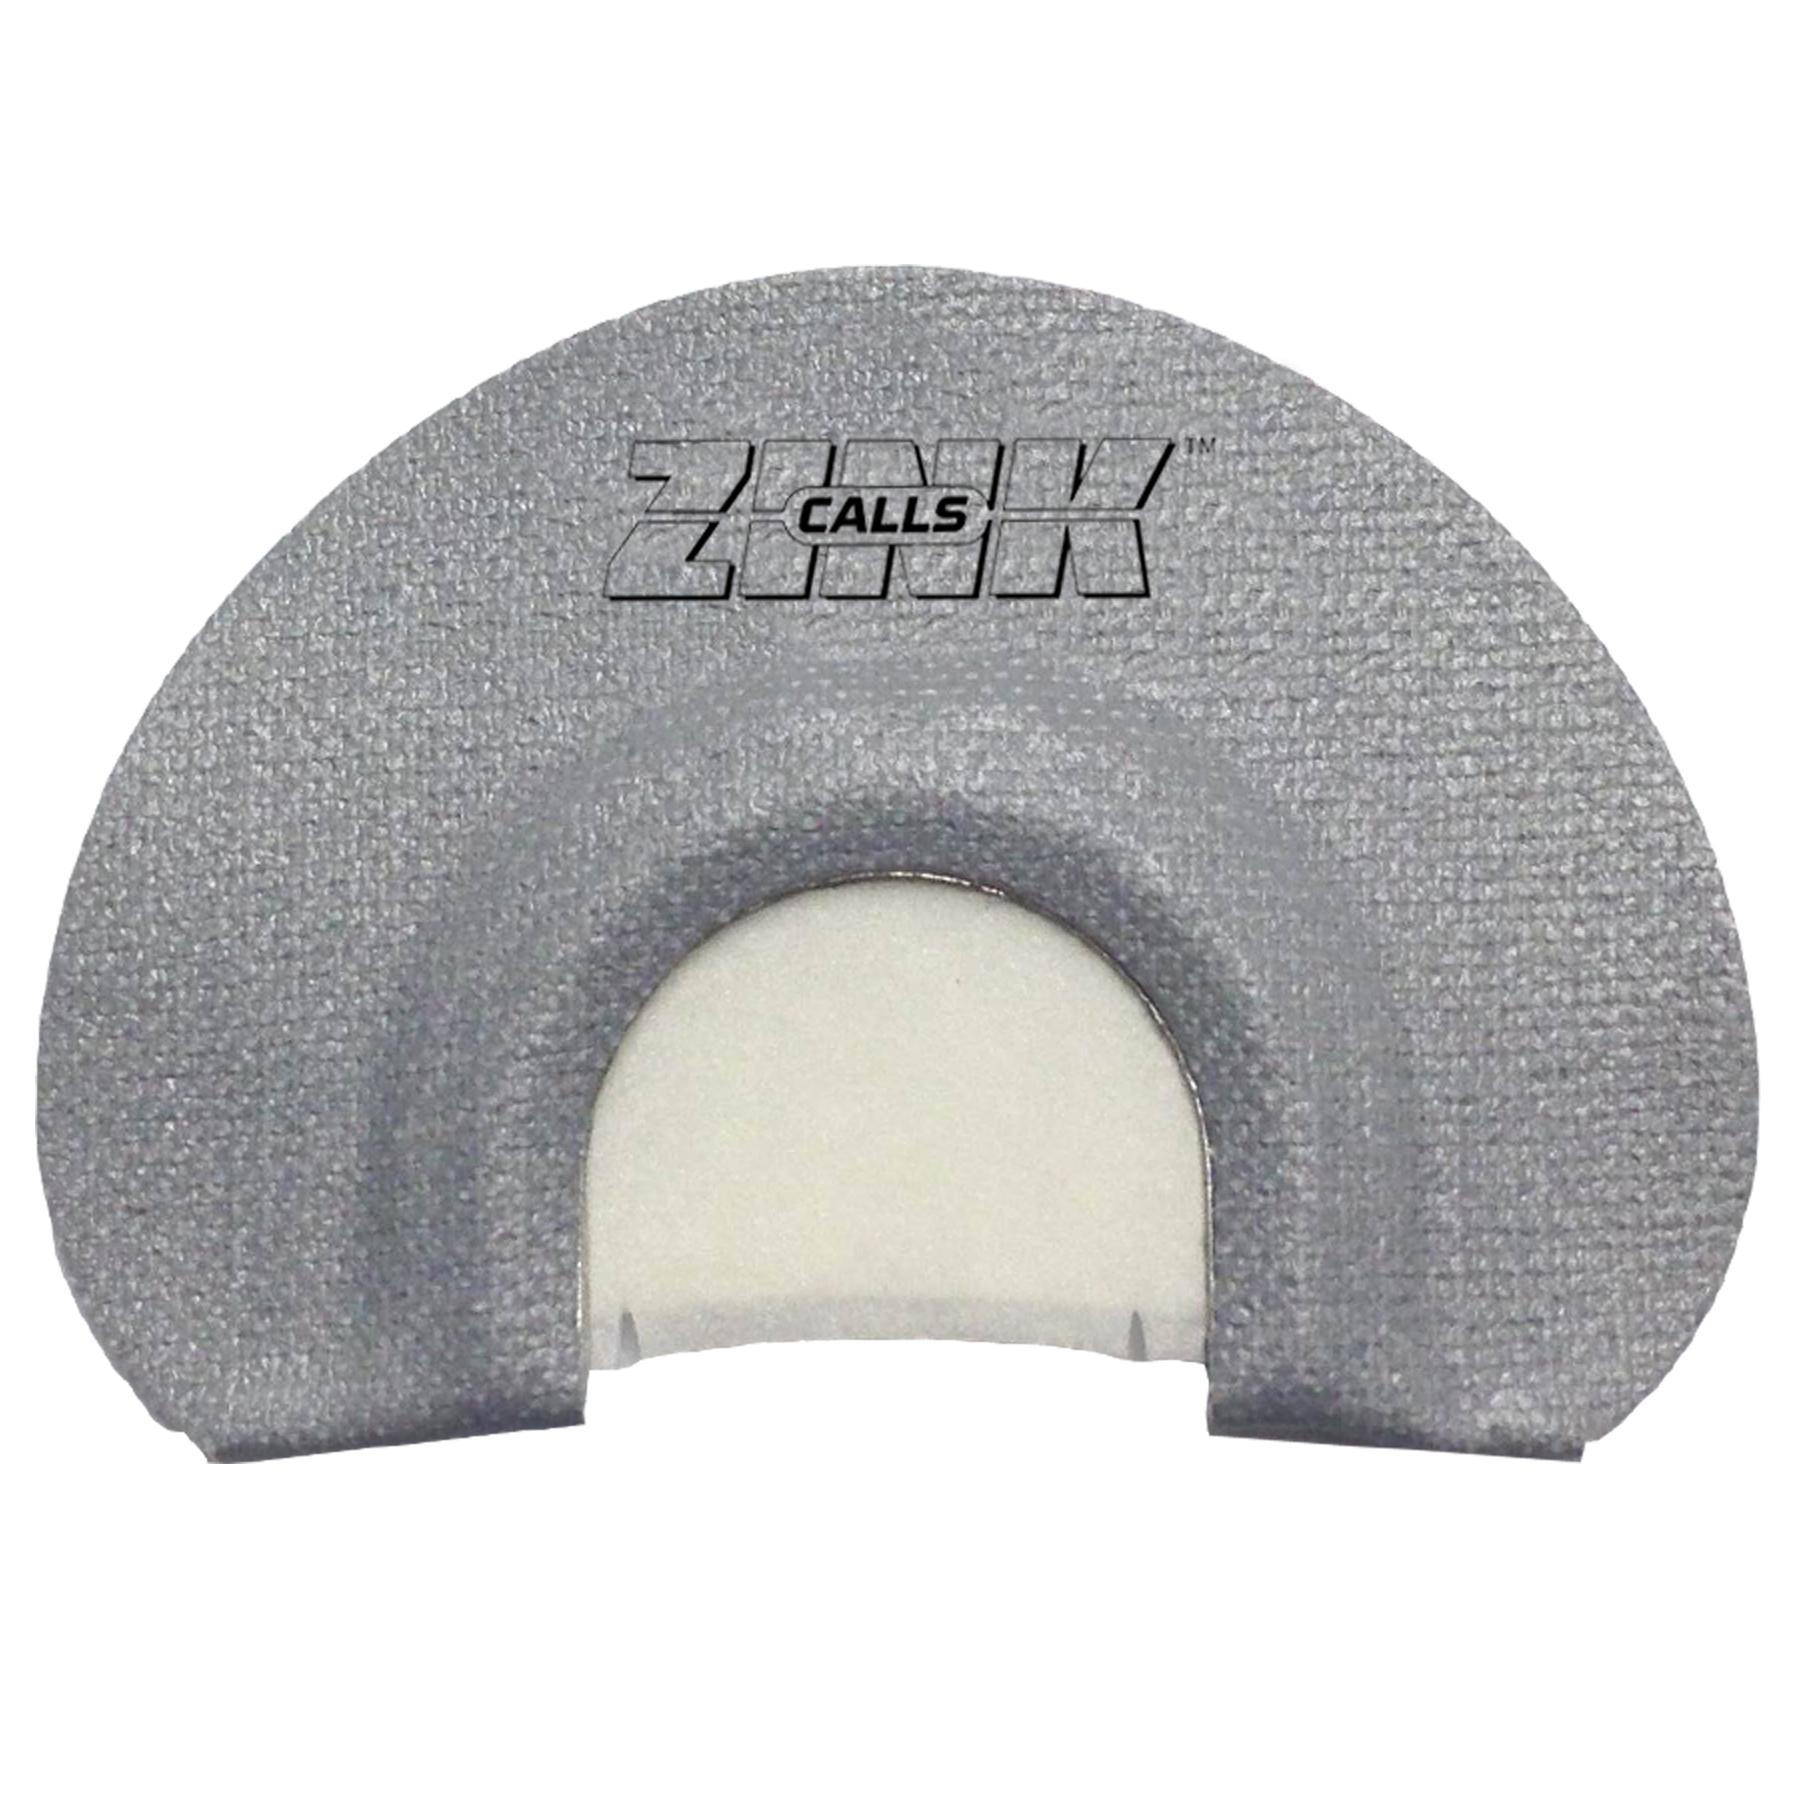 Zink Calls Z-Yelper Diaphragm Turkey Call